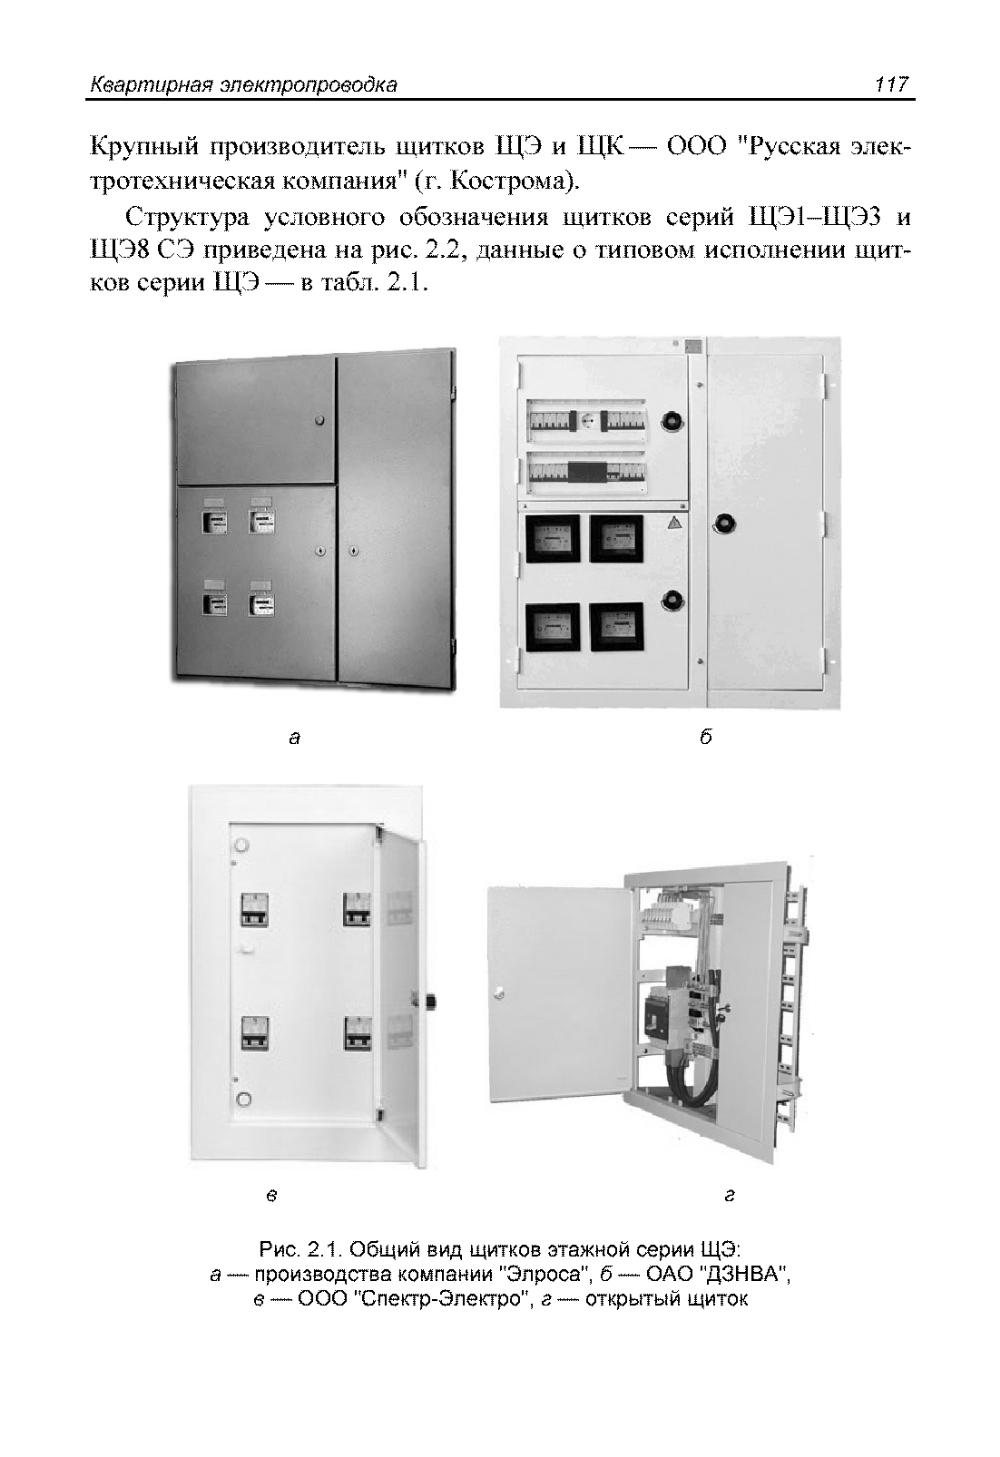 http://i2.imageban.ru/out/2013/12/05/3633b2ebdc16715d7e60704d5f1b474f.jpg